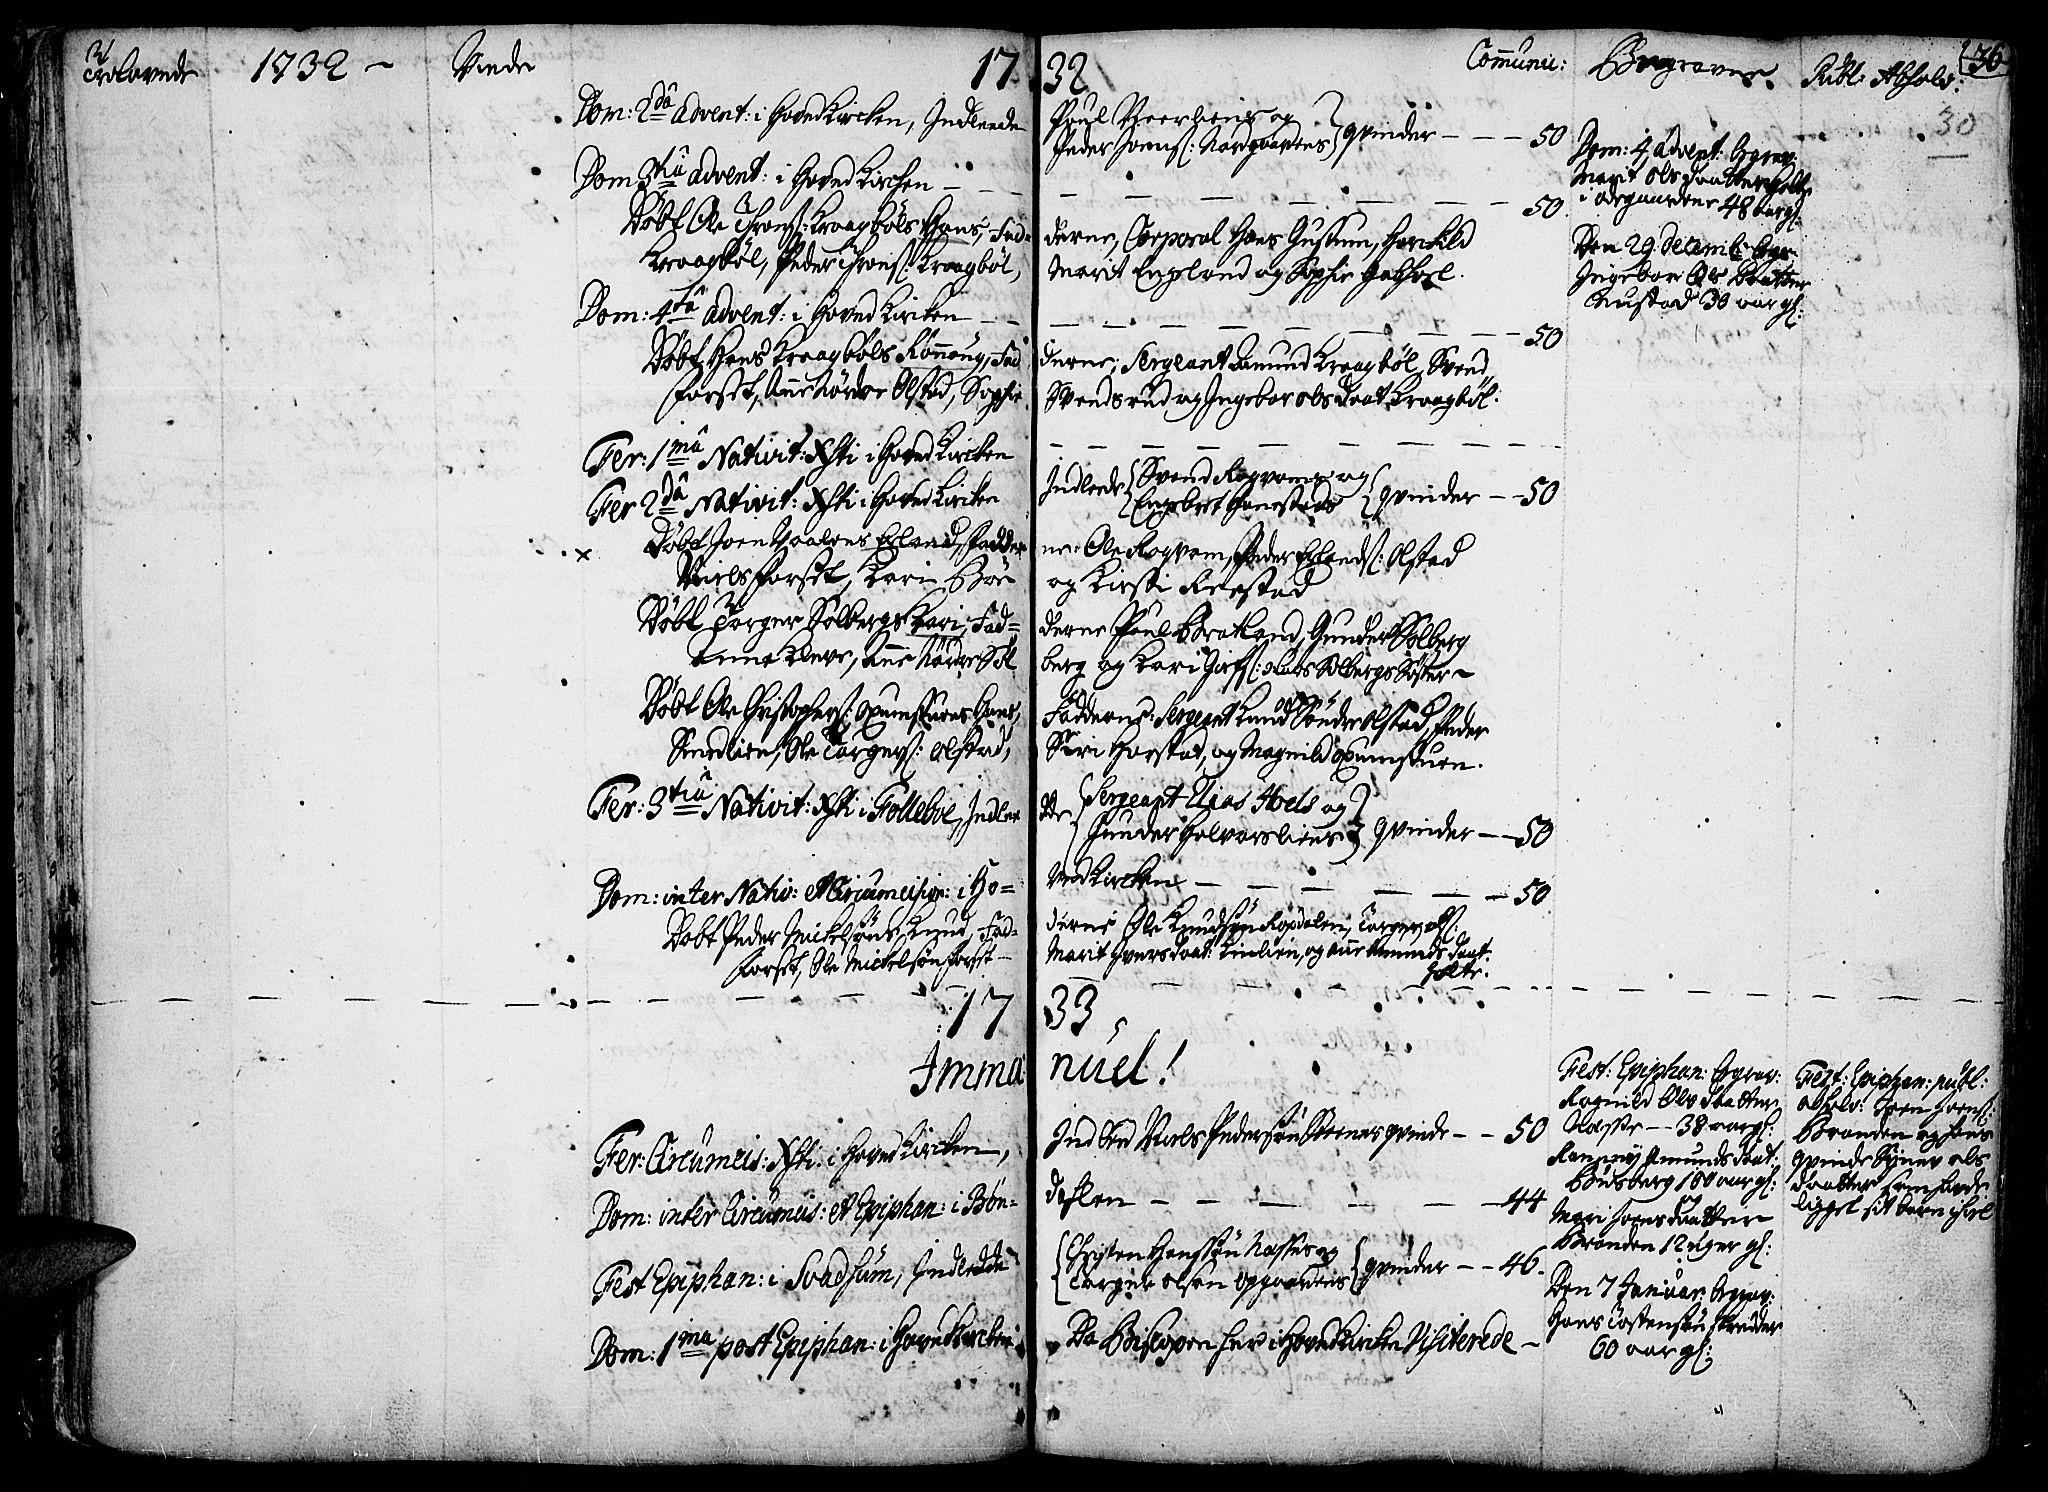 SAH, Gausdal prestekontor, Ministerialbok nr. 2, 1729-1757, s. 30